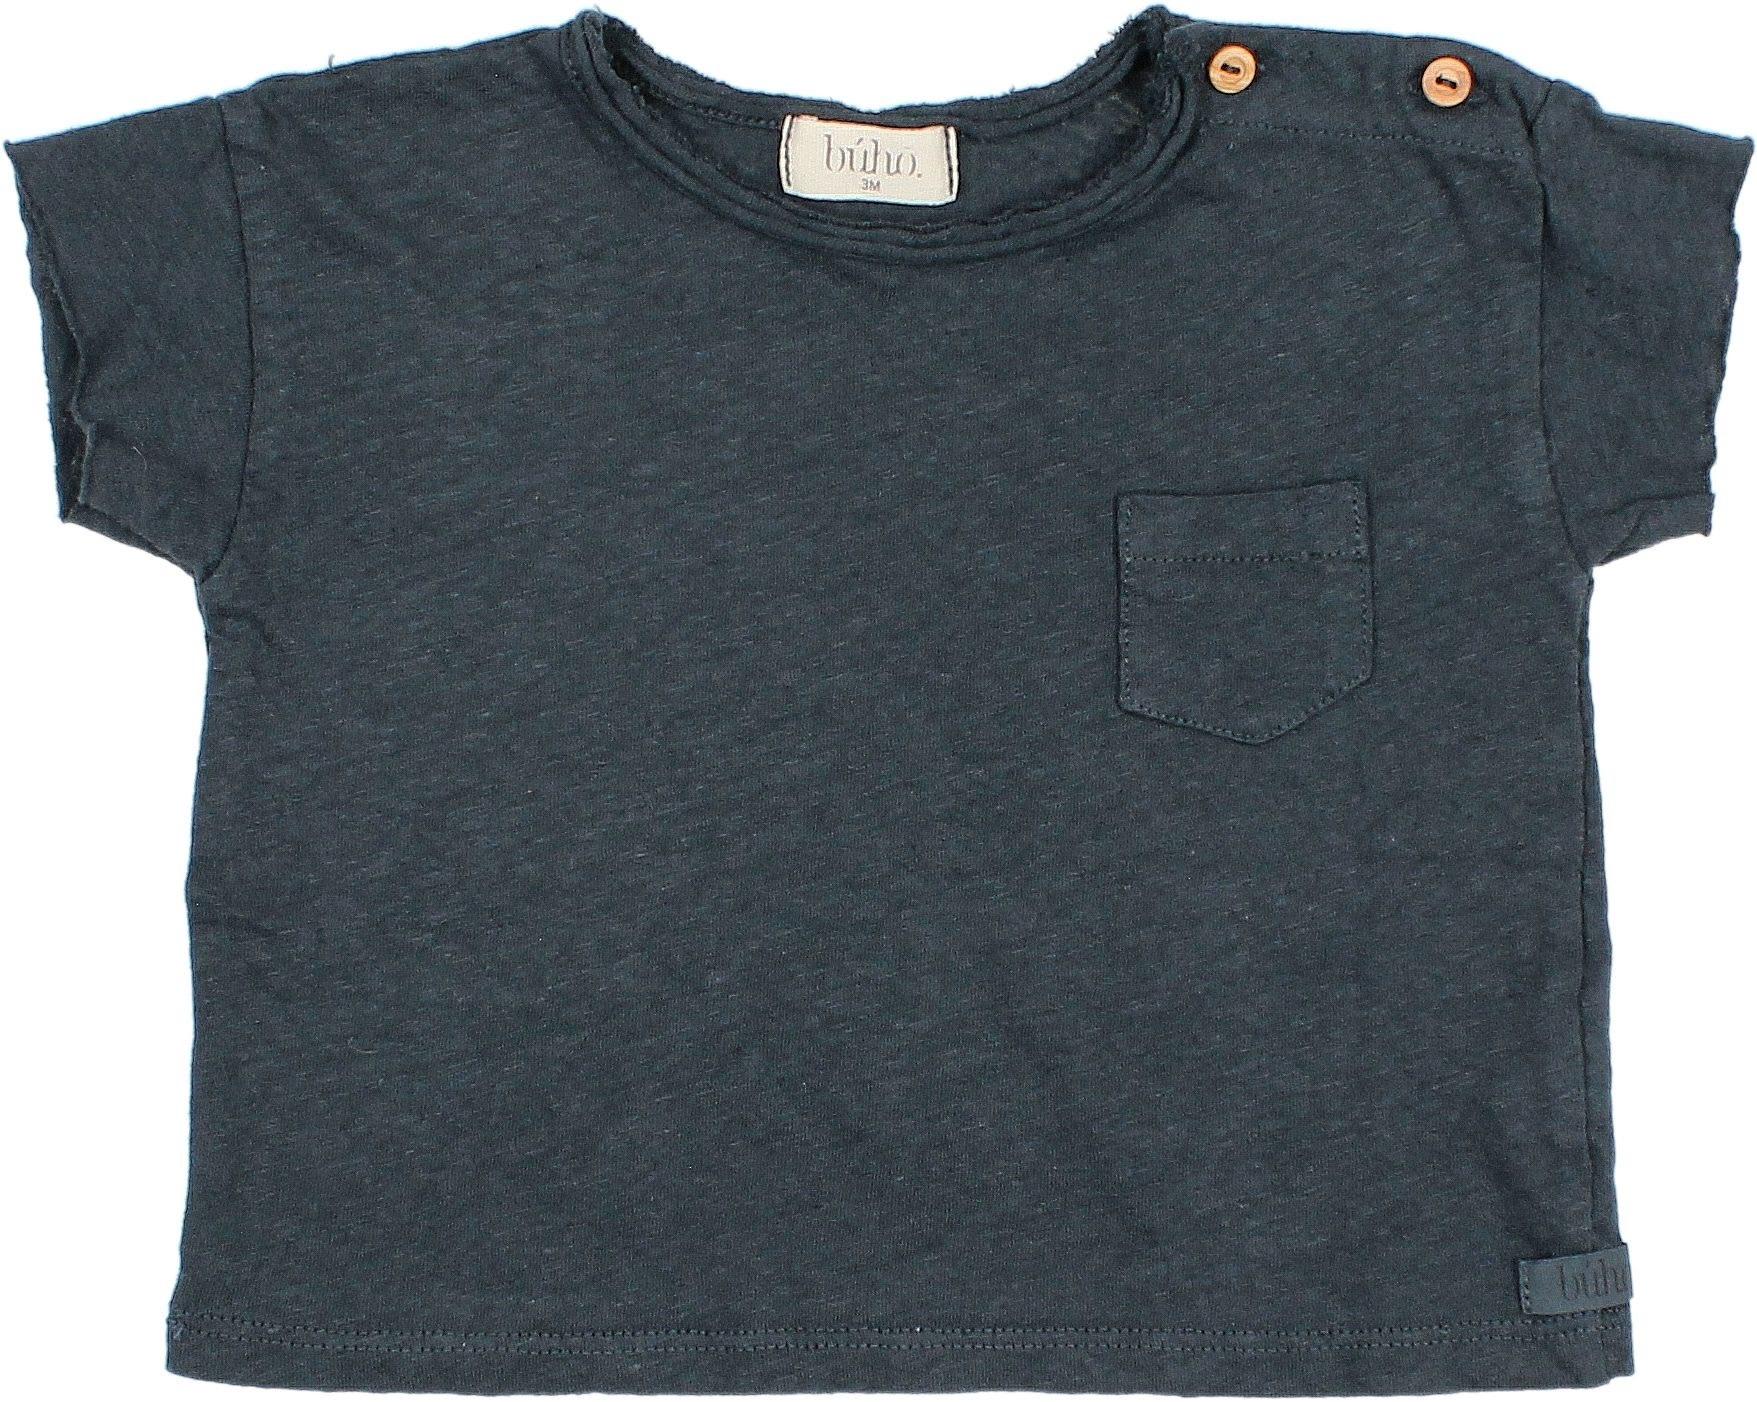 BUHO Baby  Cotton Linen T-Shirt